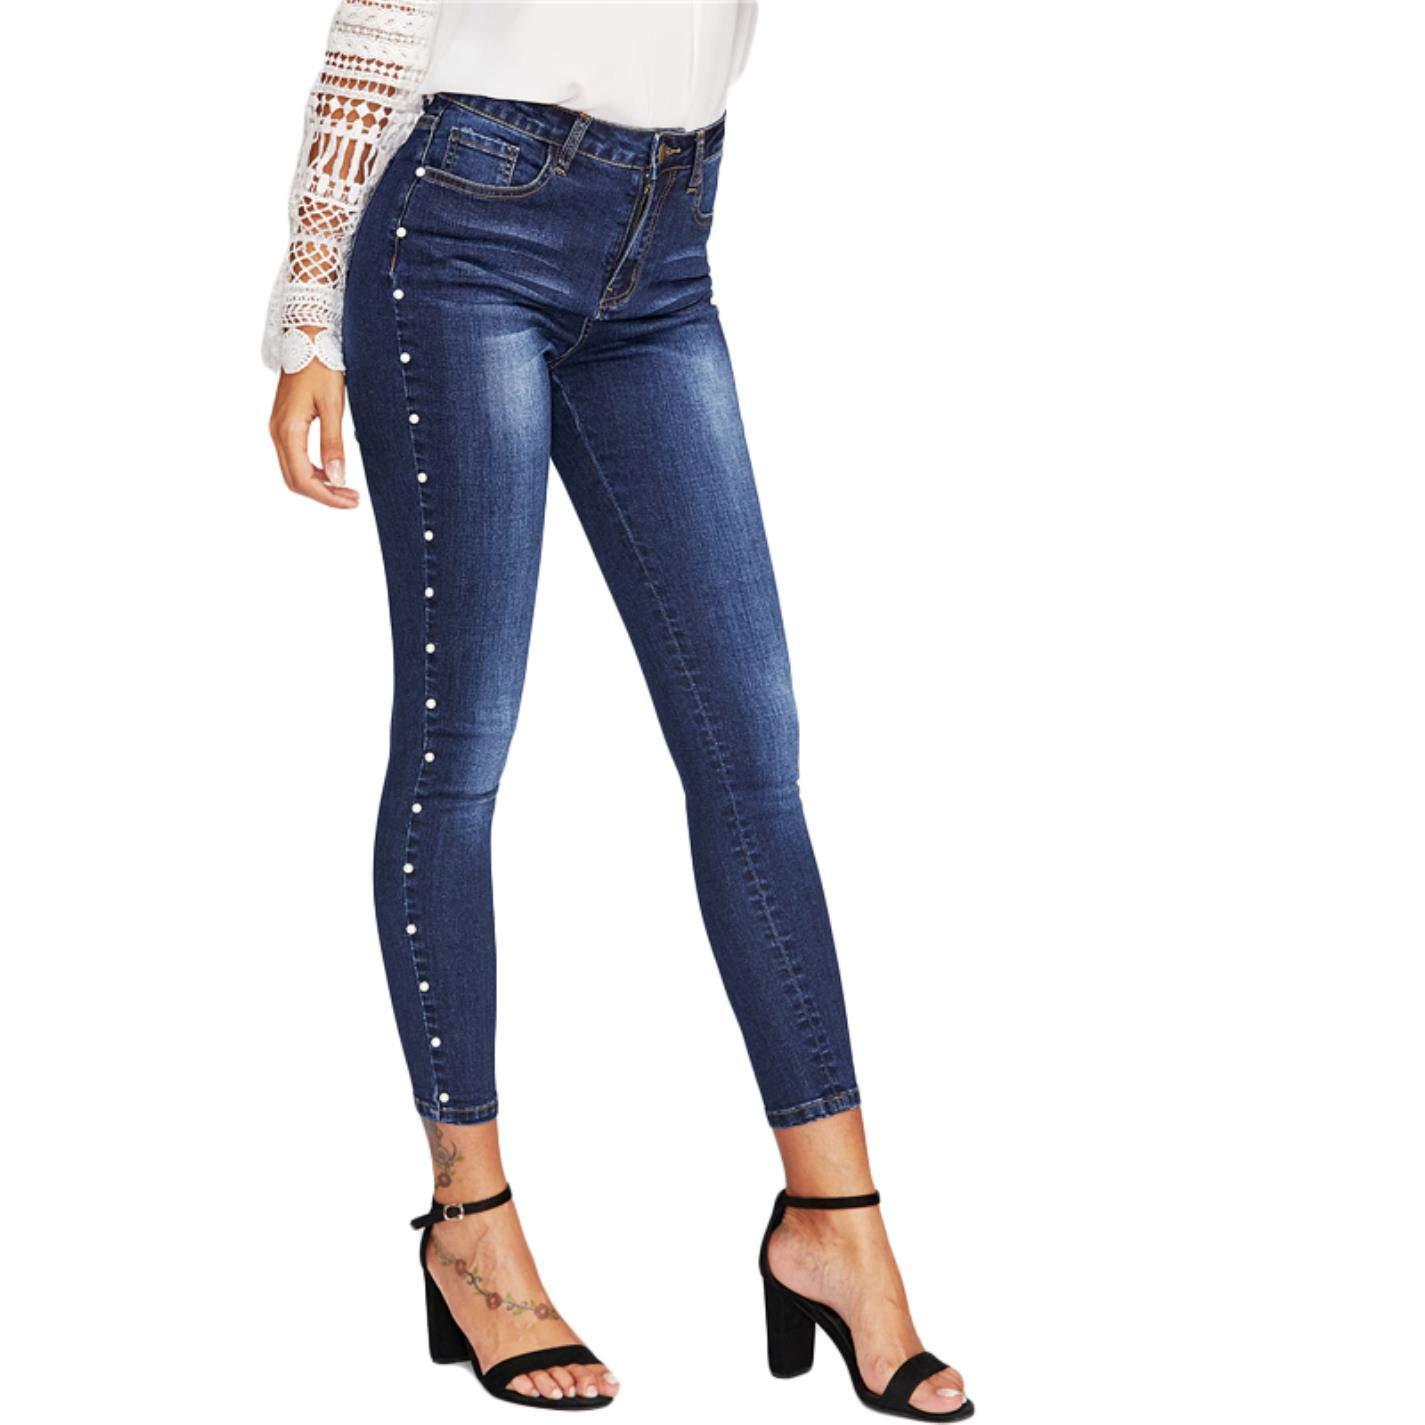 BxjkaEWA Womens Skinny Pearl Beaded Jeans Mid Waist Zip Casual Pants